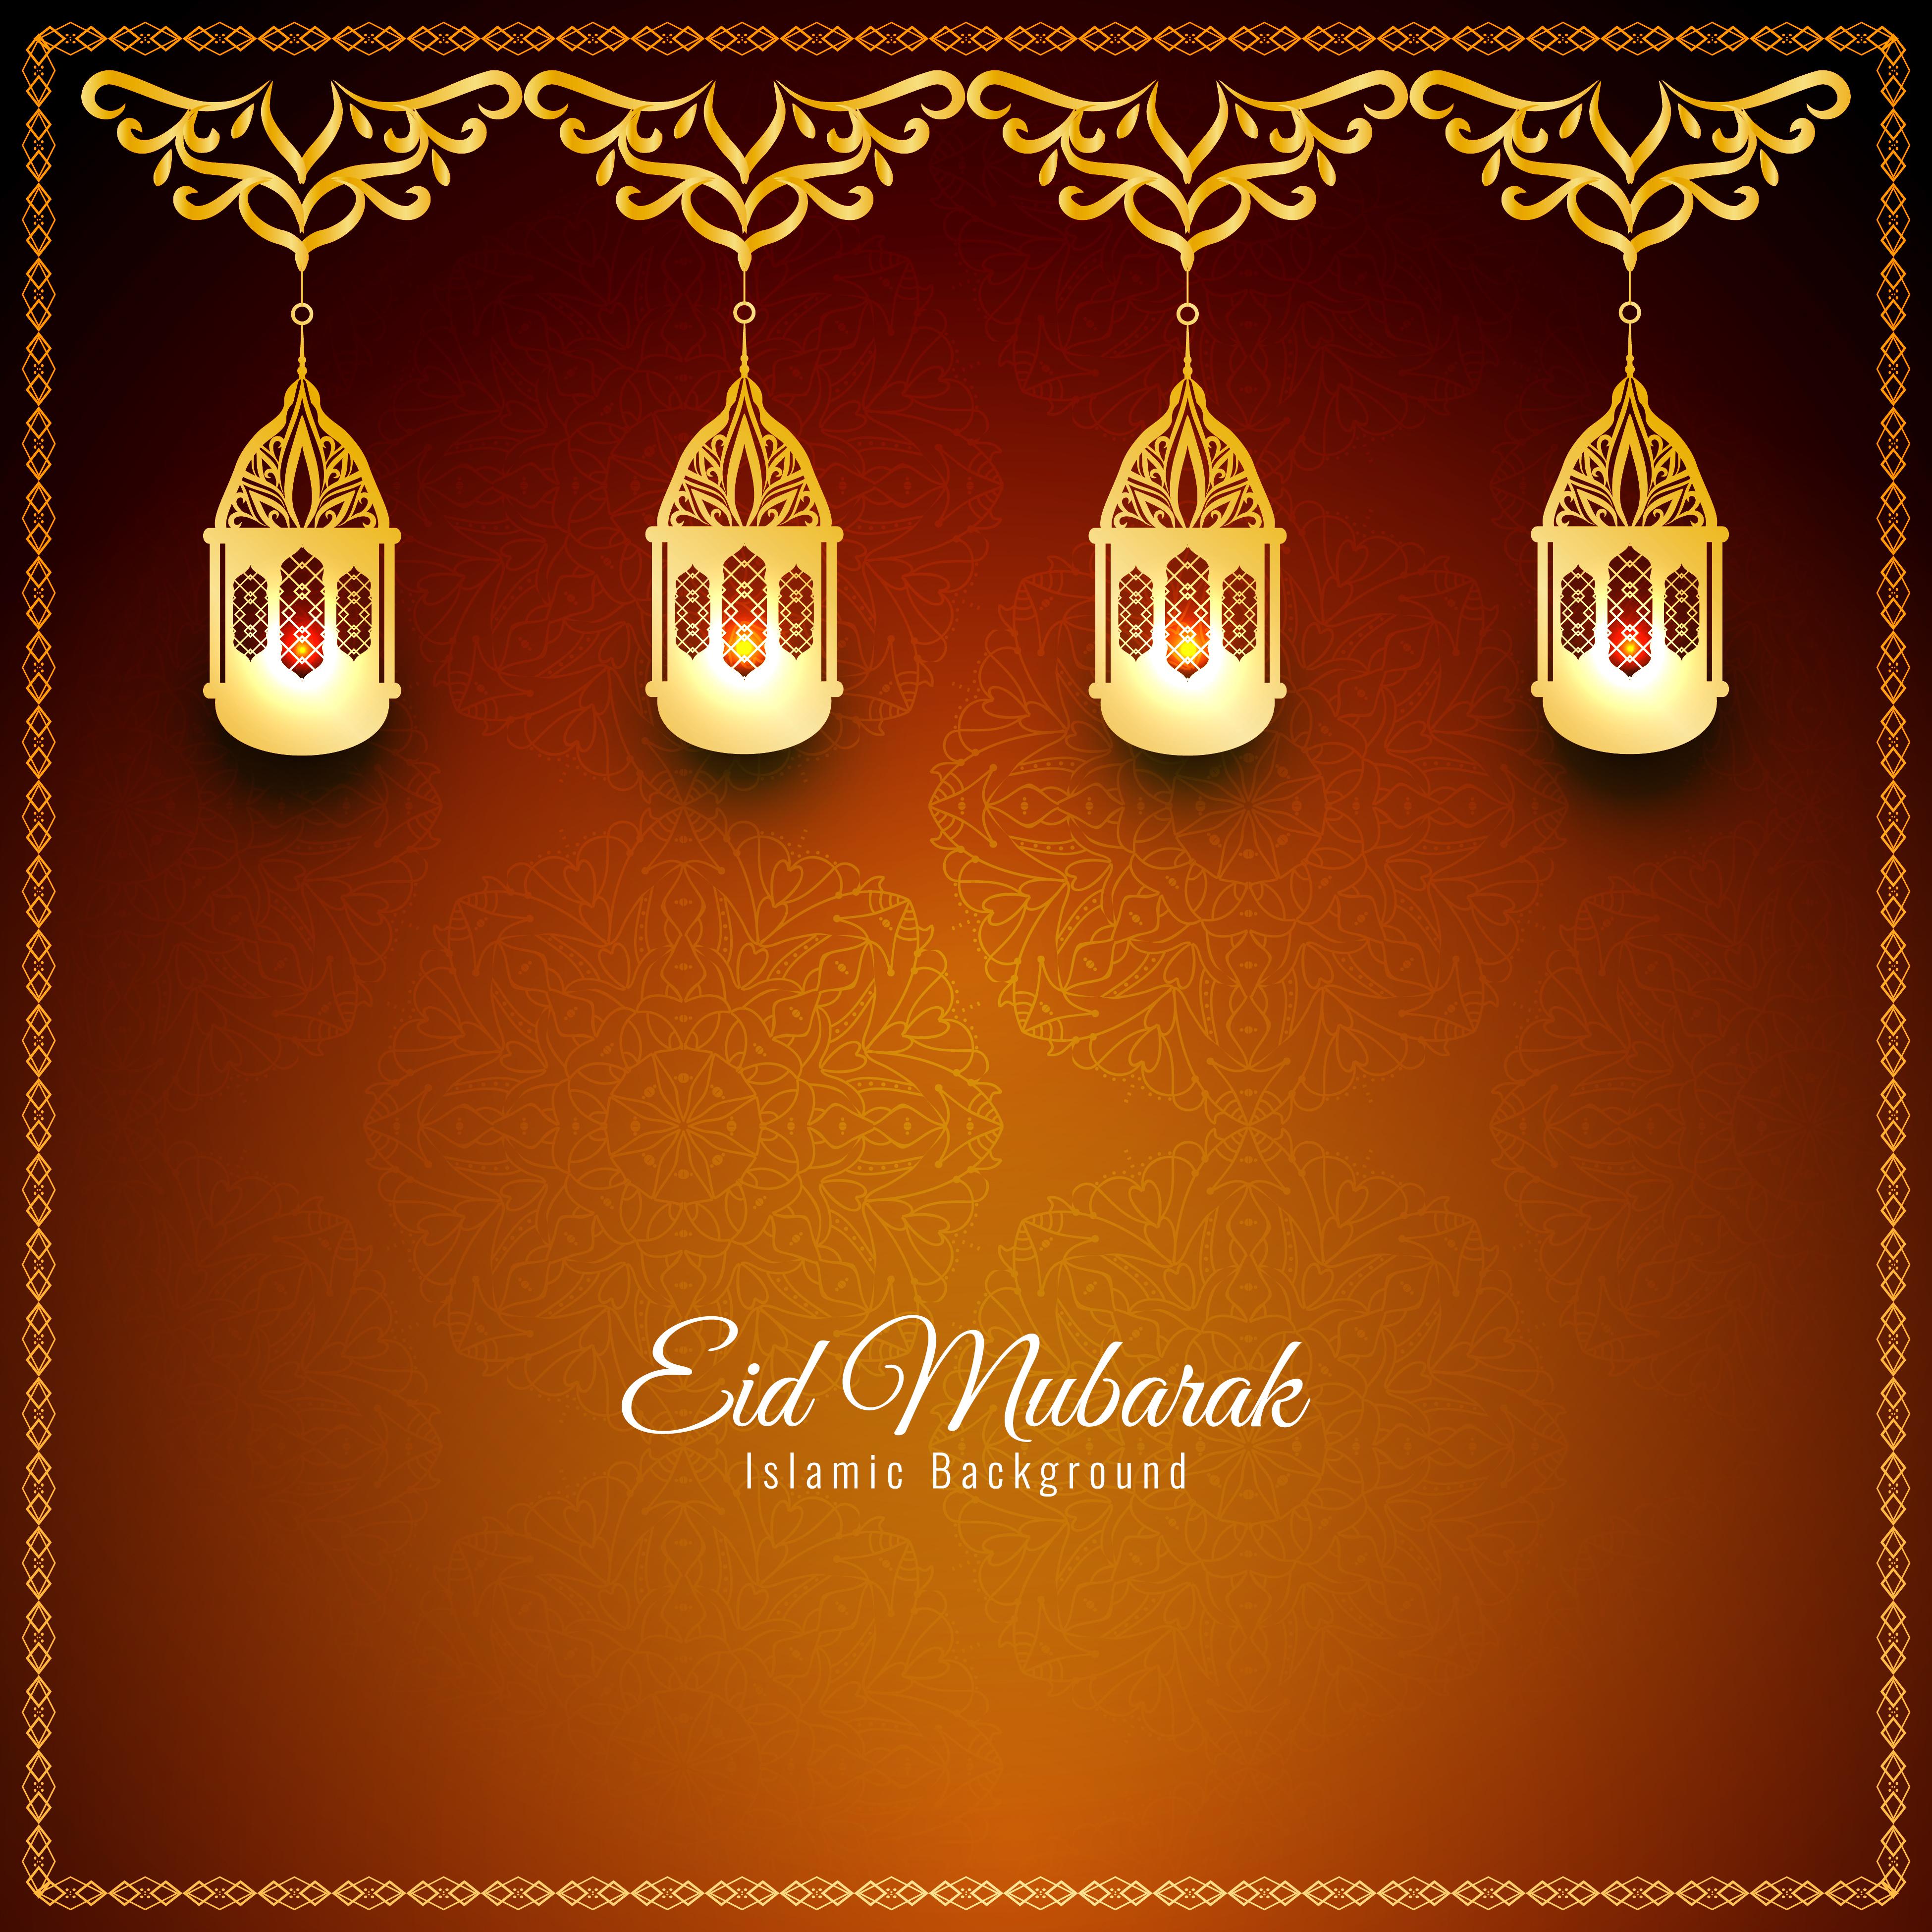 Abstract Eid Mubarak Stylish Background Design